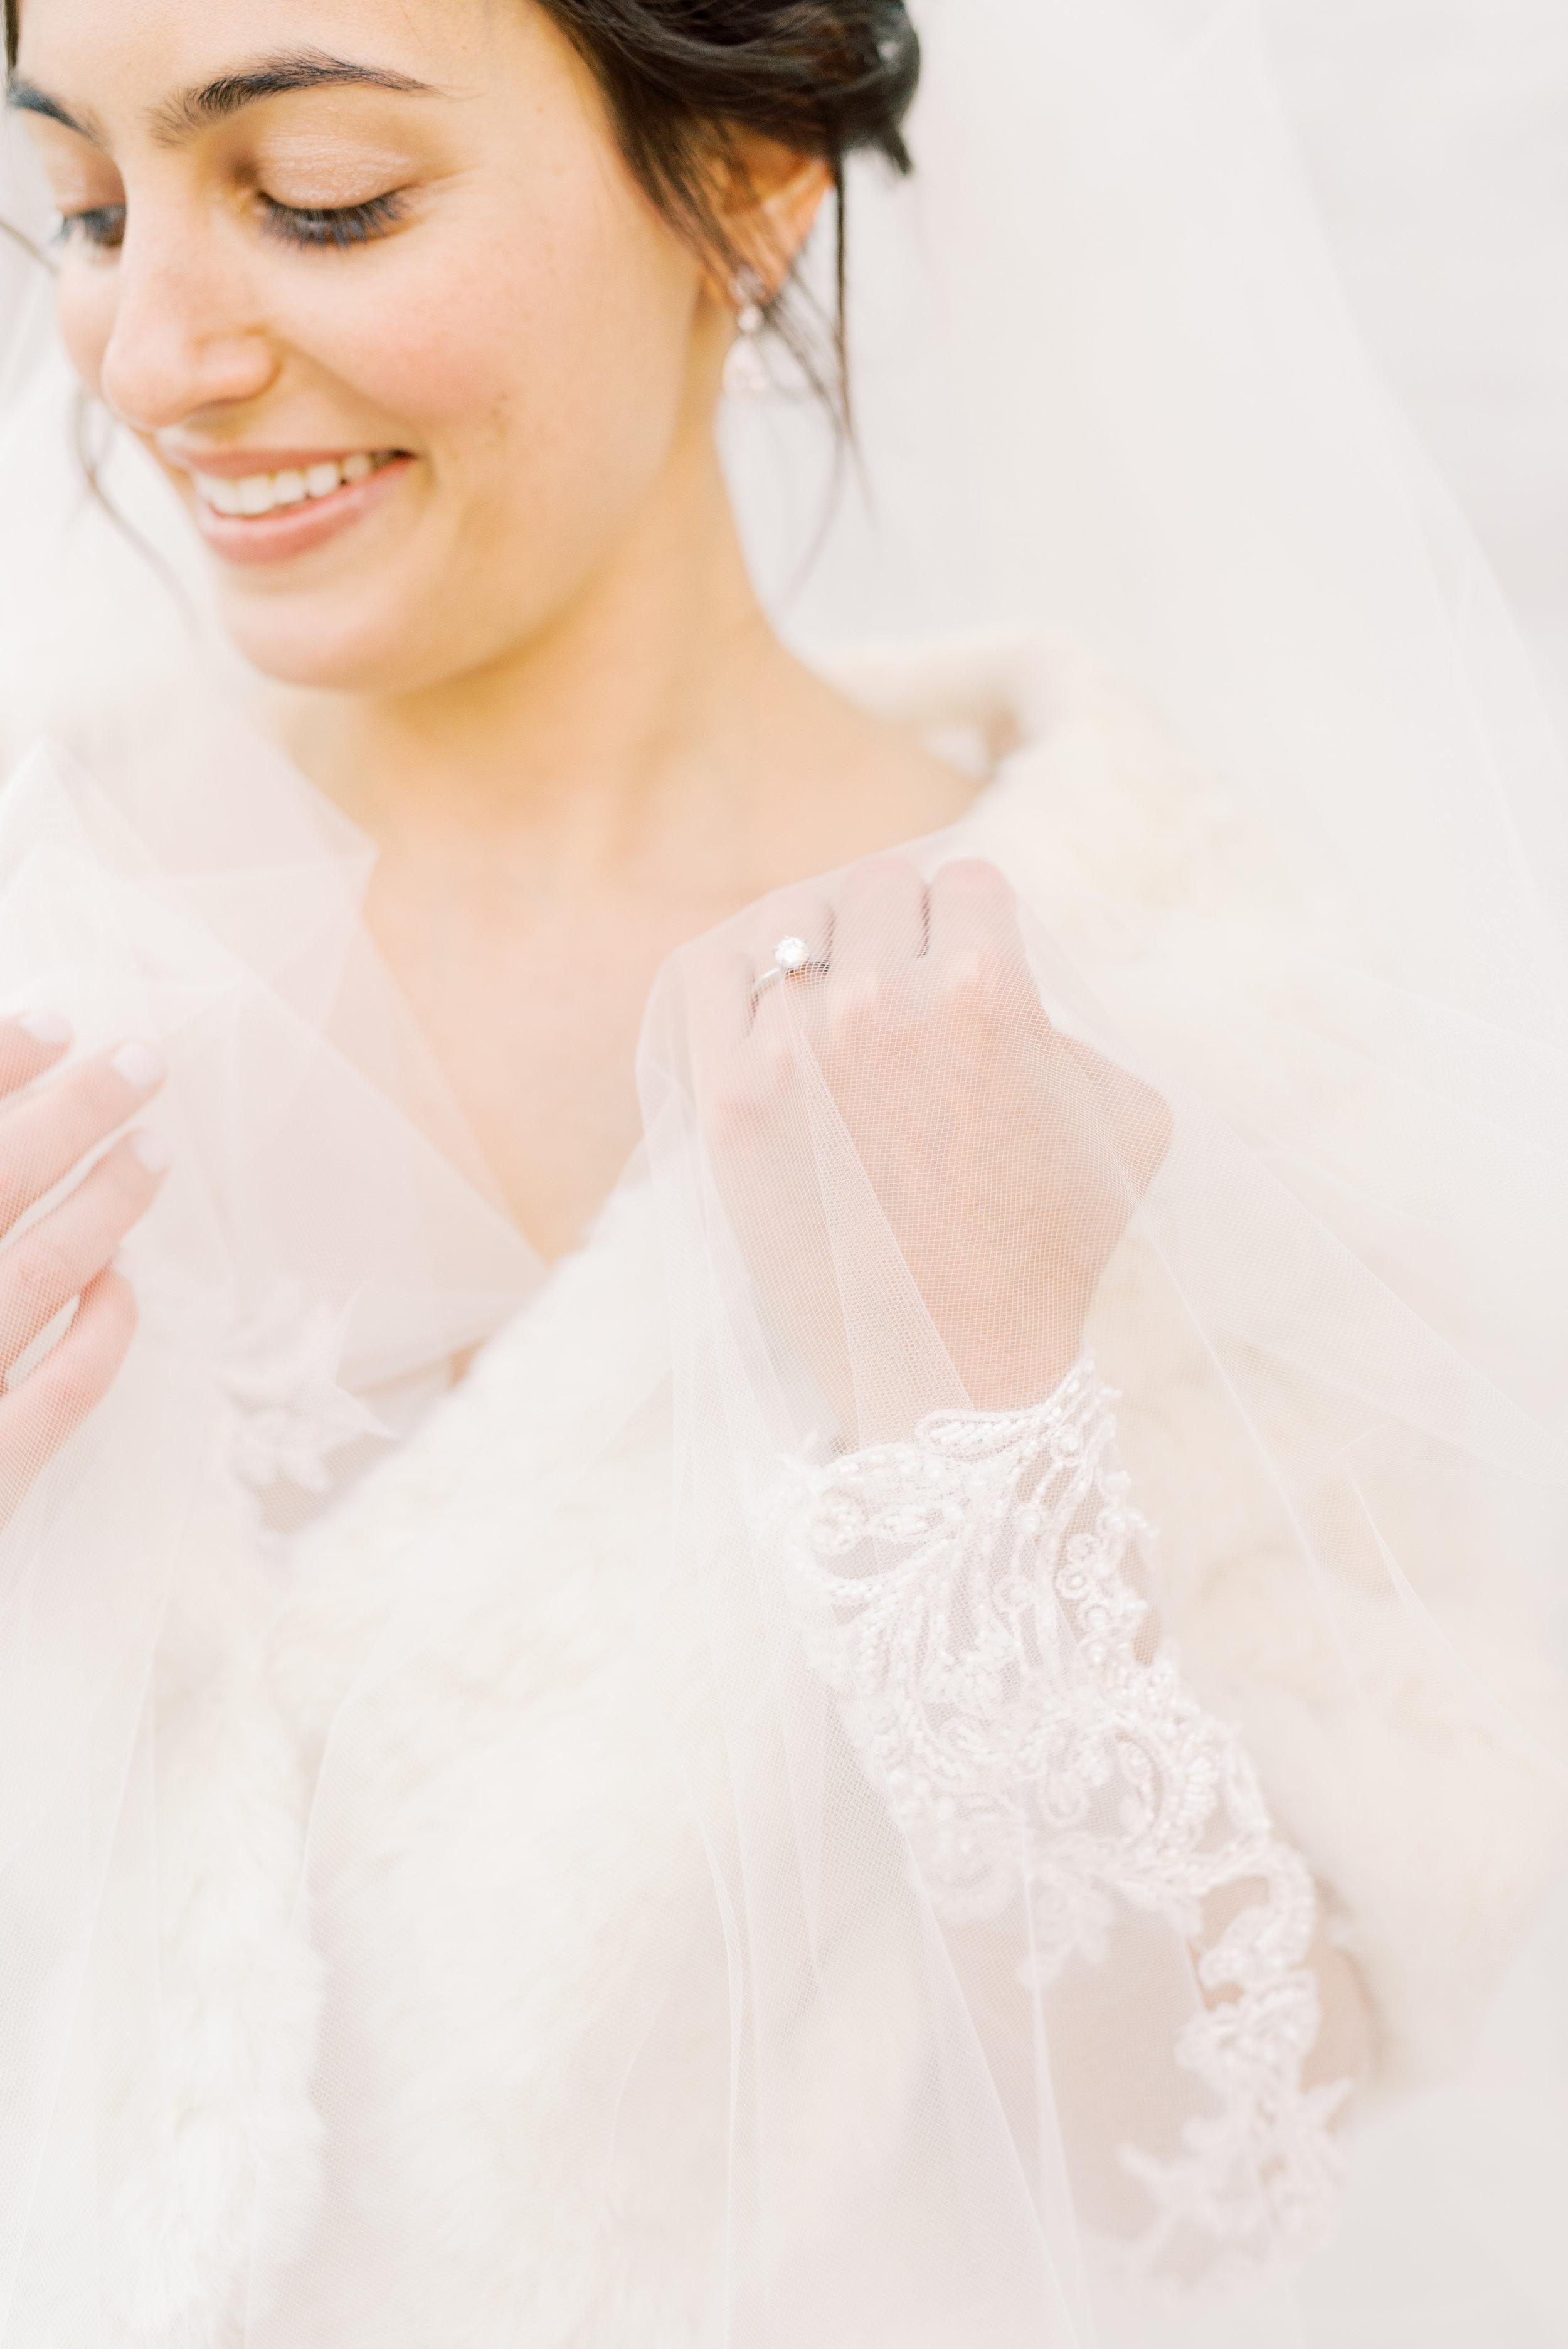 haley-richter-photography-classic-winter-union-trust-philadelphia-wedding-057.jpg